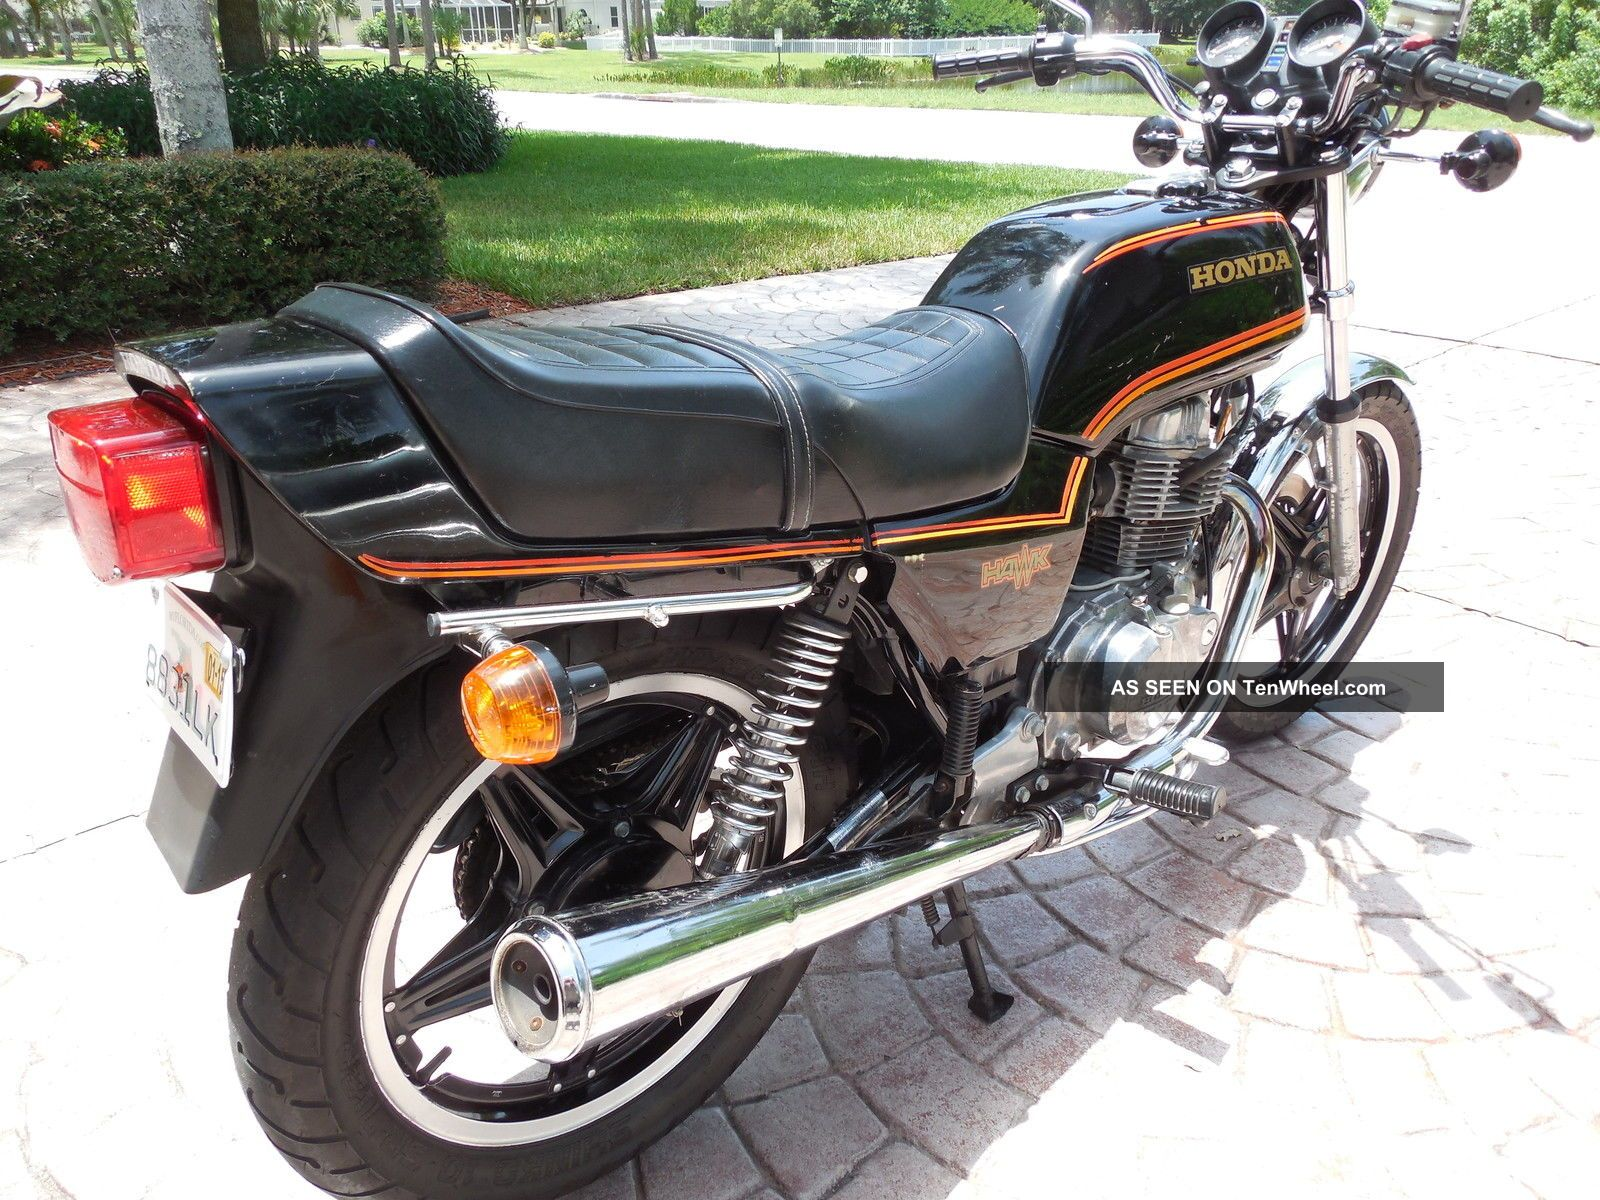 Moto Honda CB 400 - 1980 - R$ 7500.0